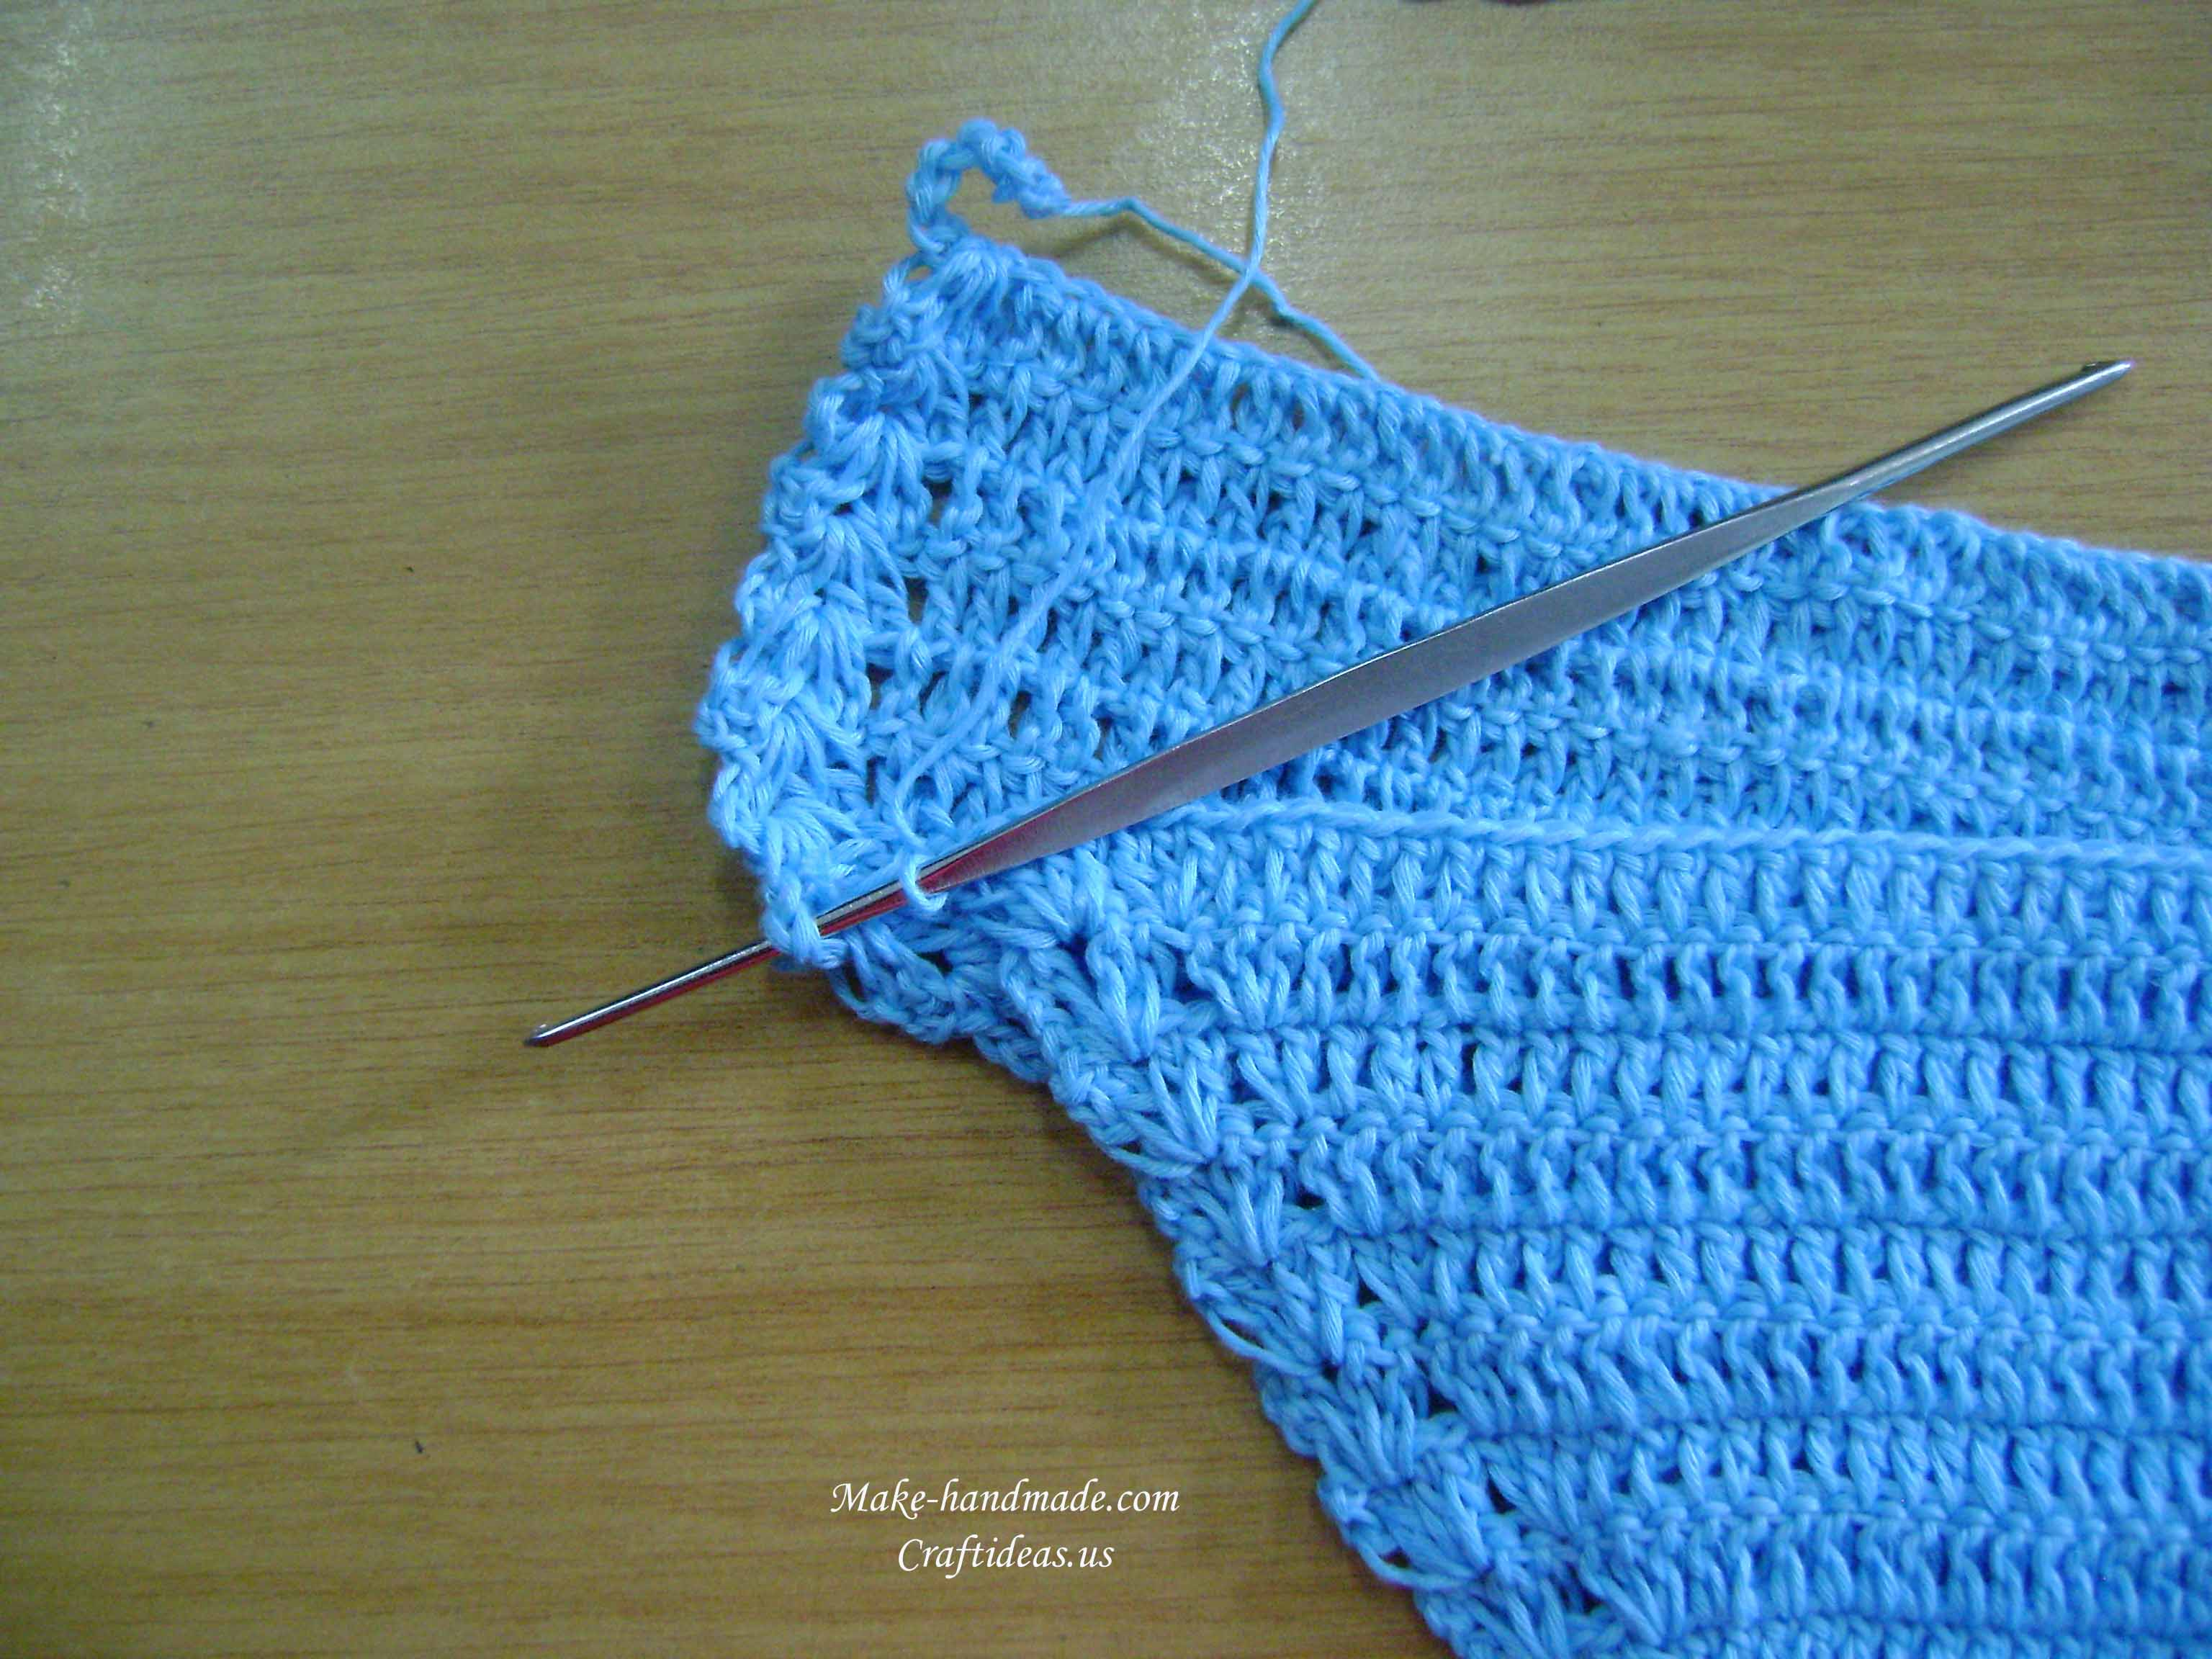 handmade, crochet ideas